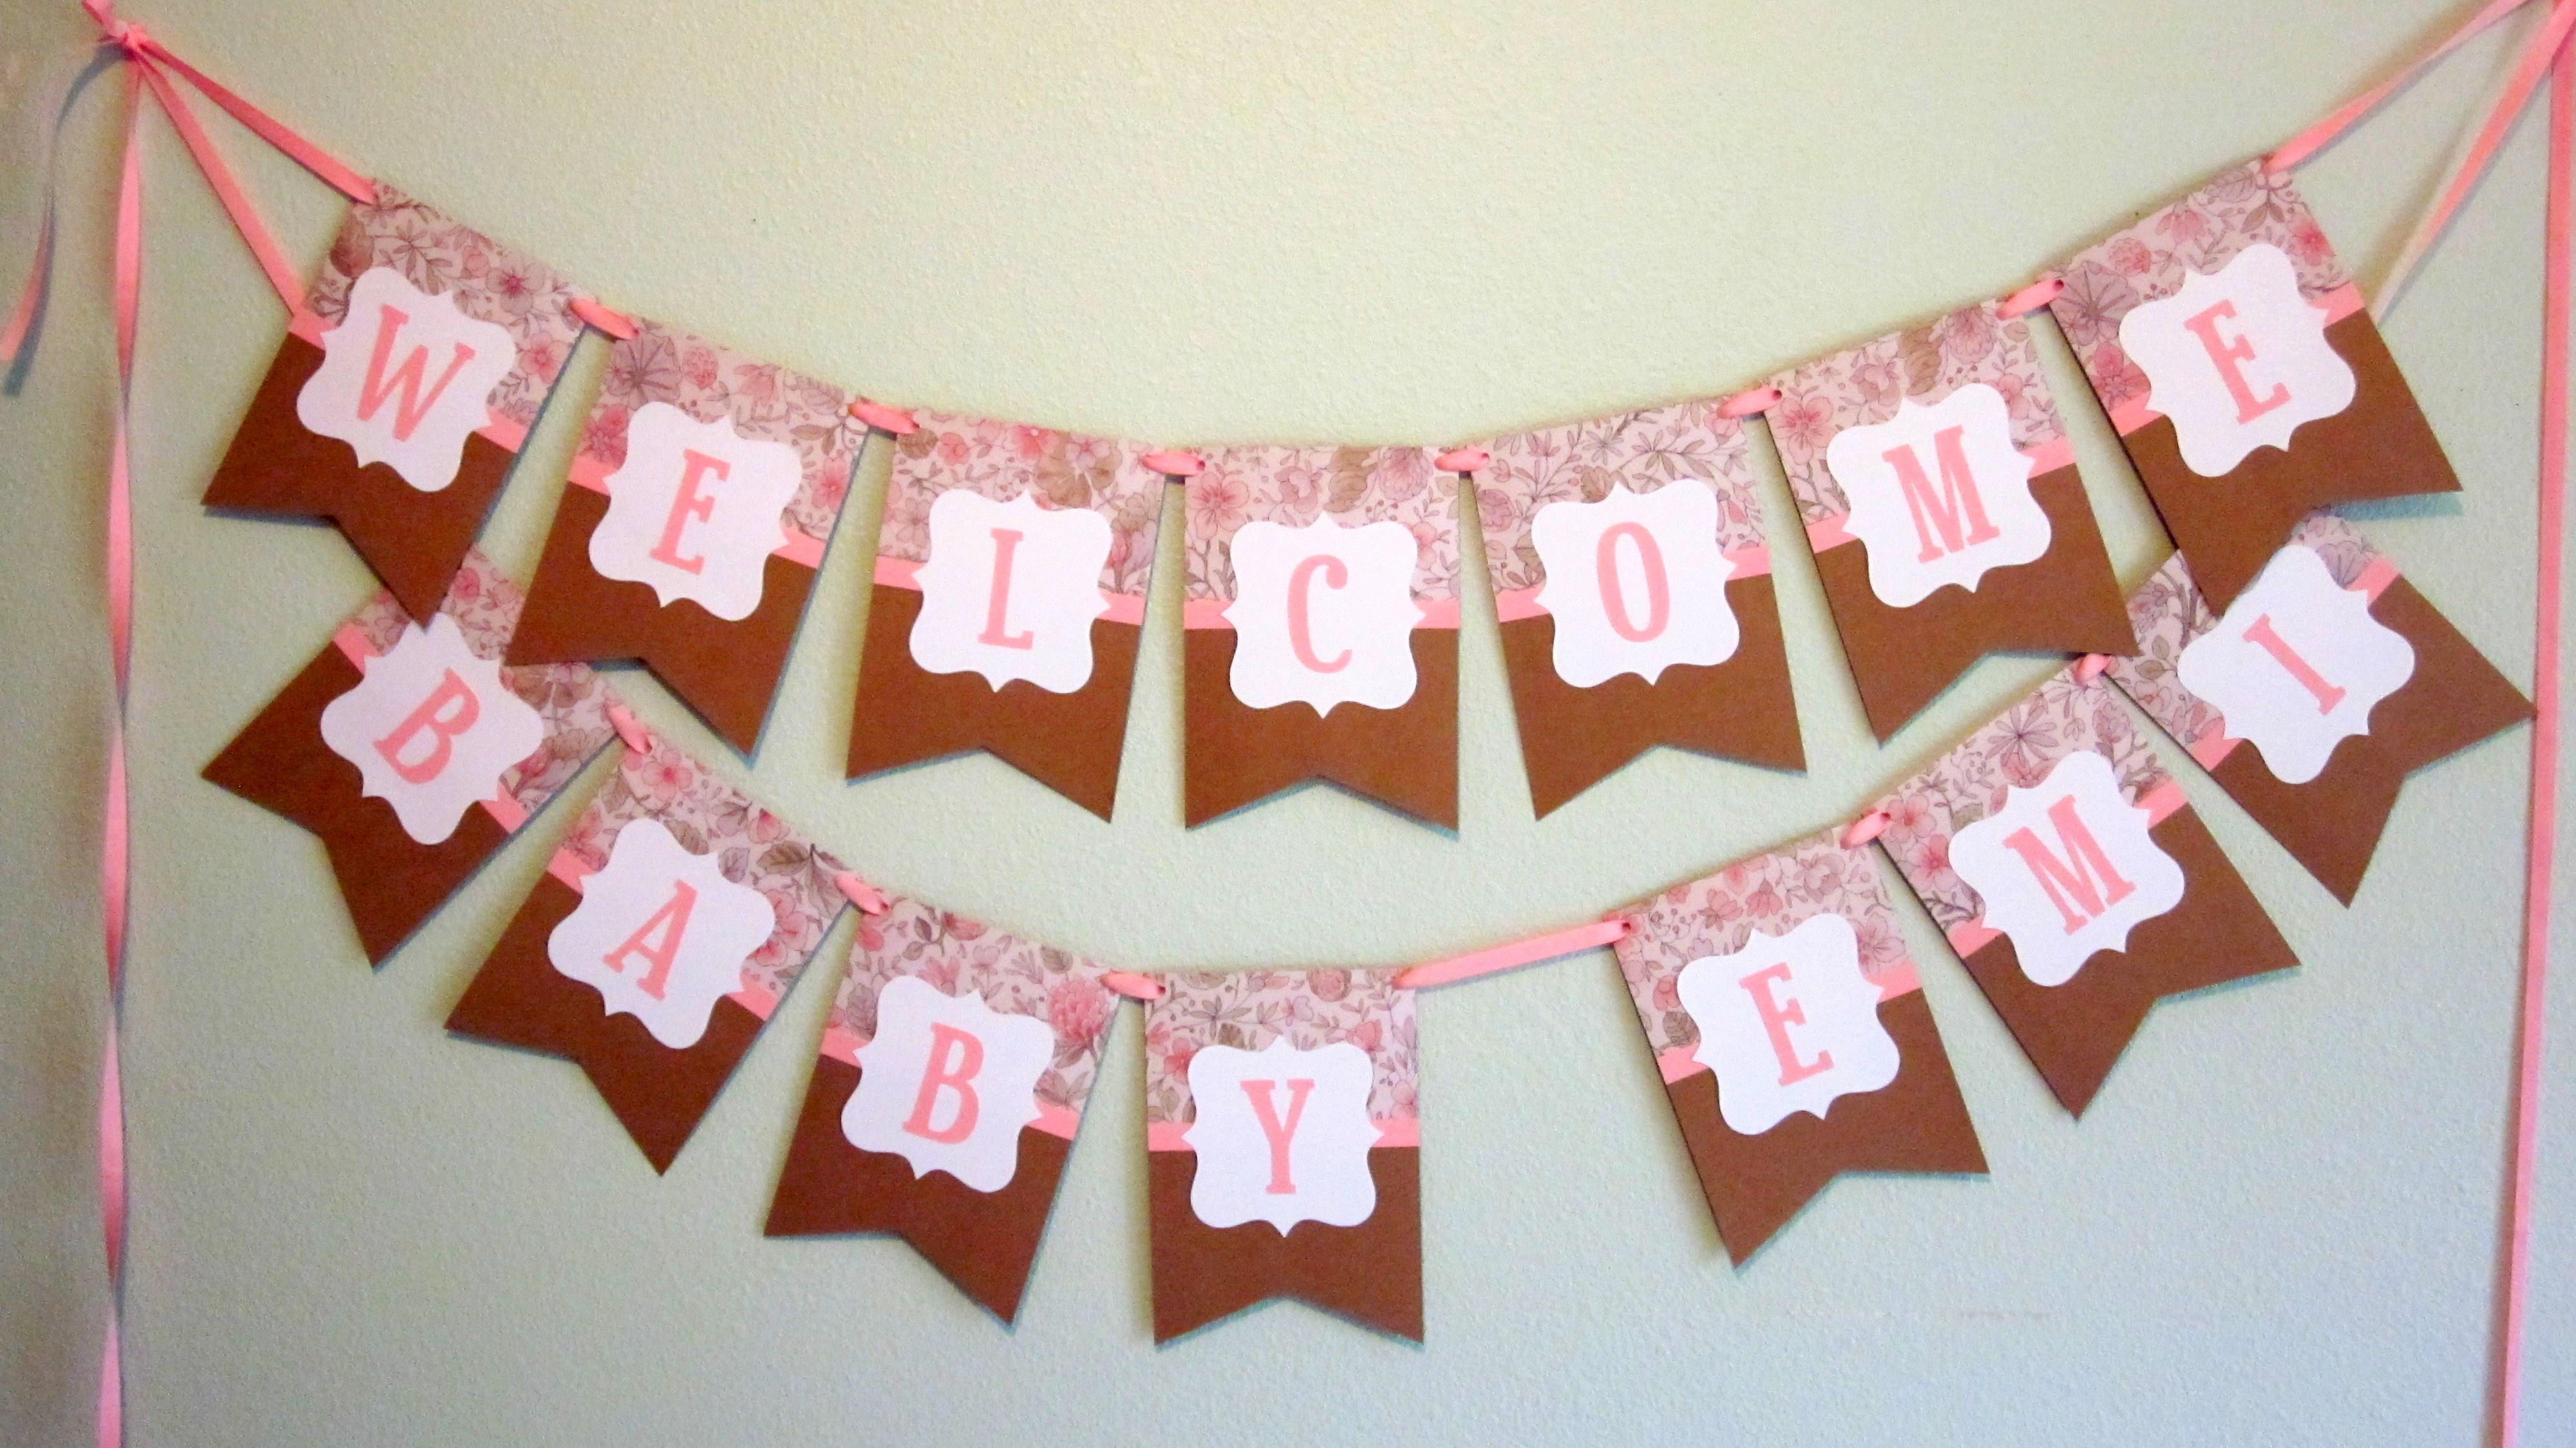 Shabby Chic Banners | Semi-DIY